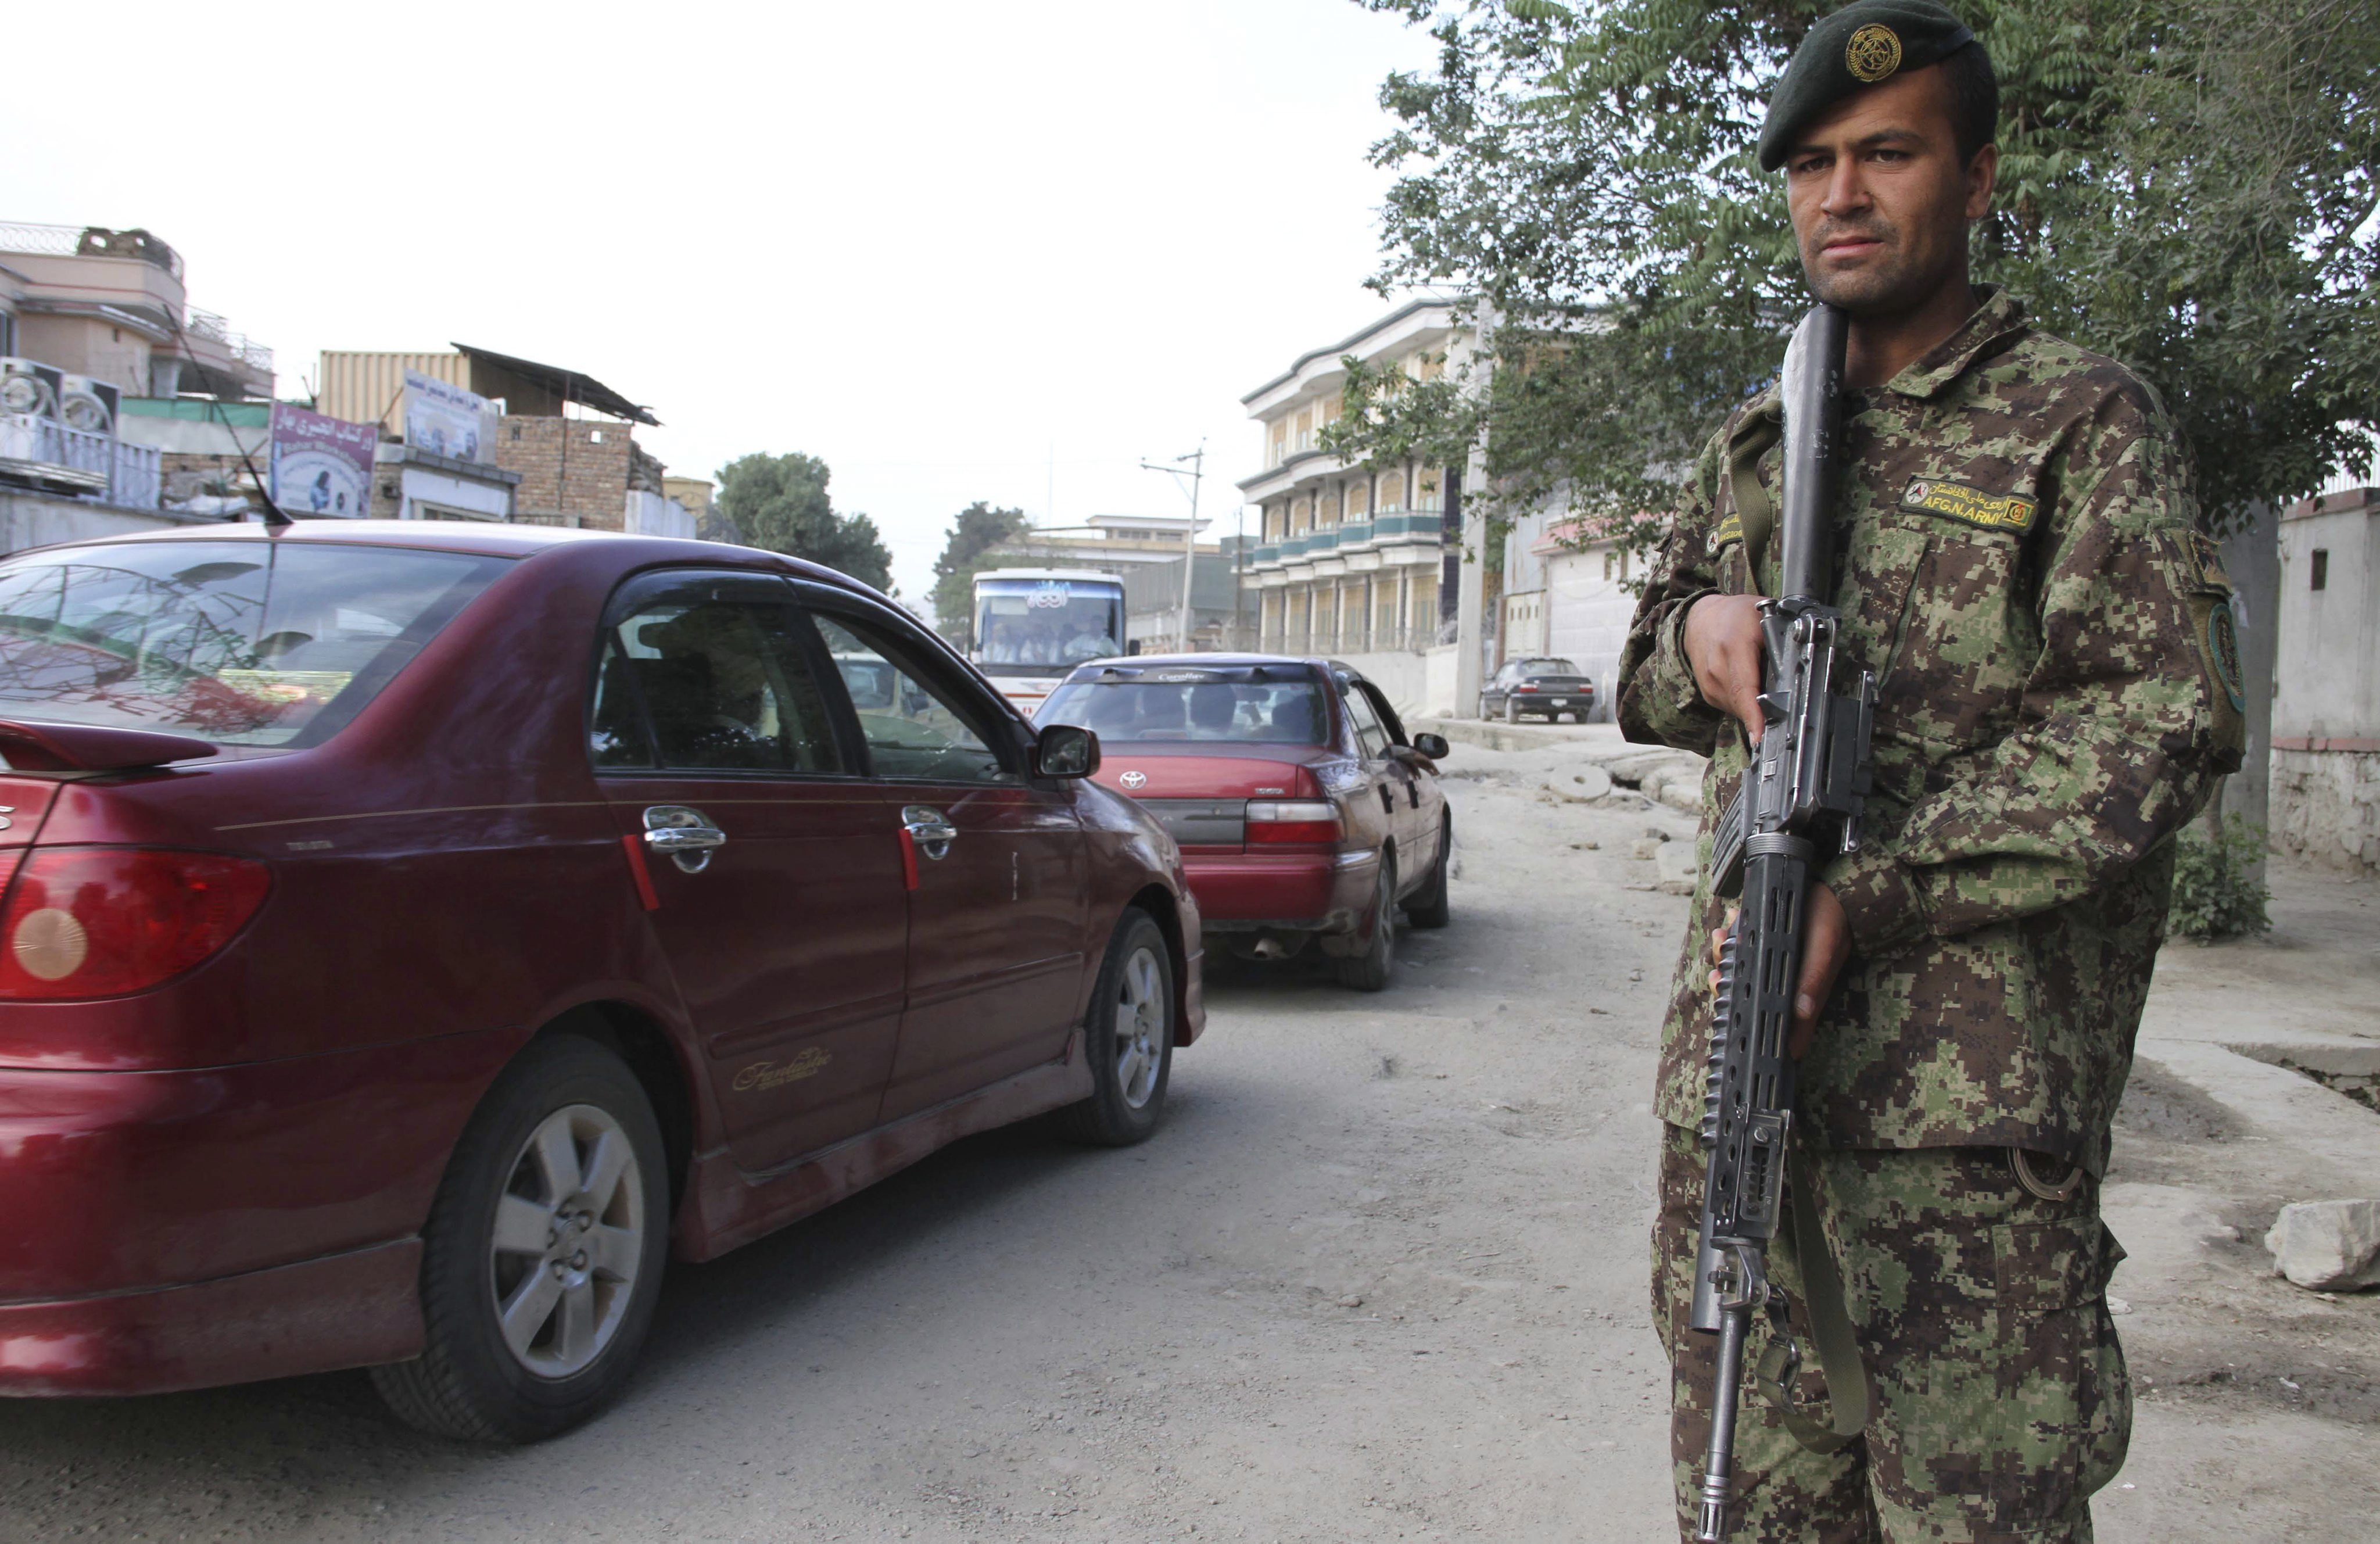 Dos cohetes caen en la embajada estadounidense en Kabul sin causar heridos